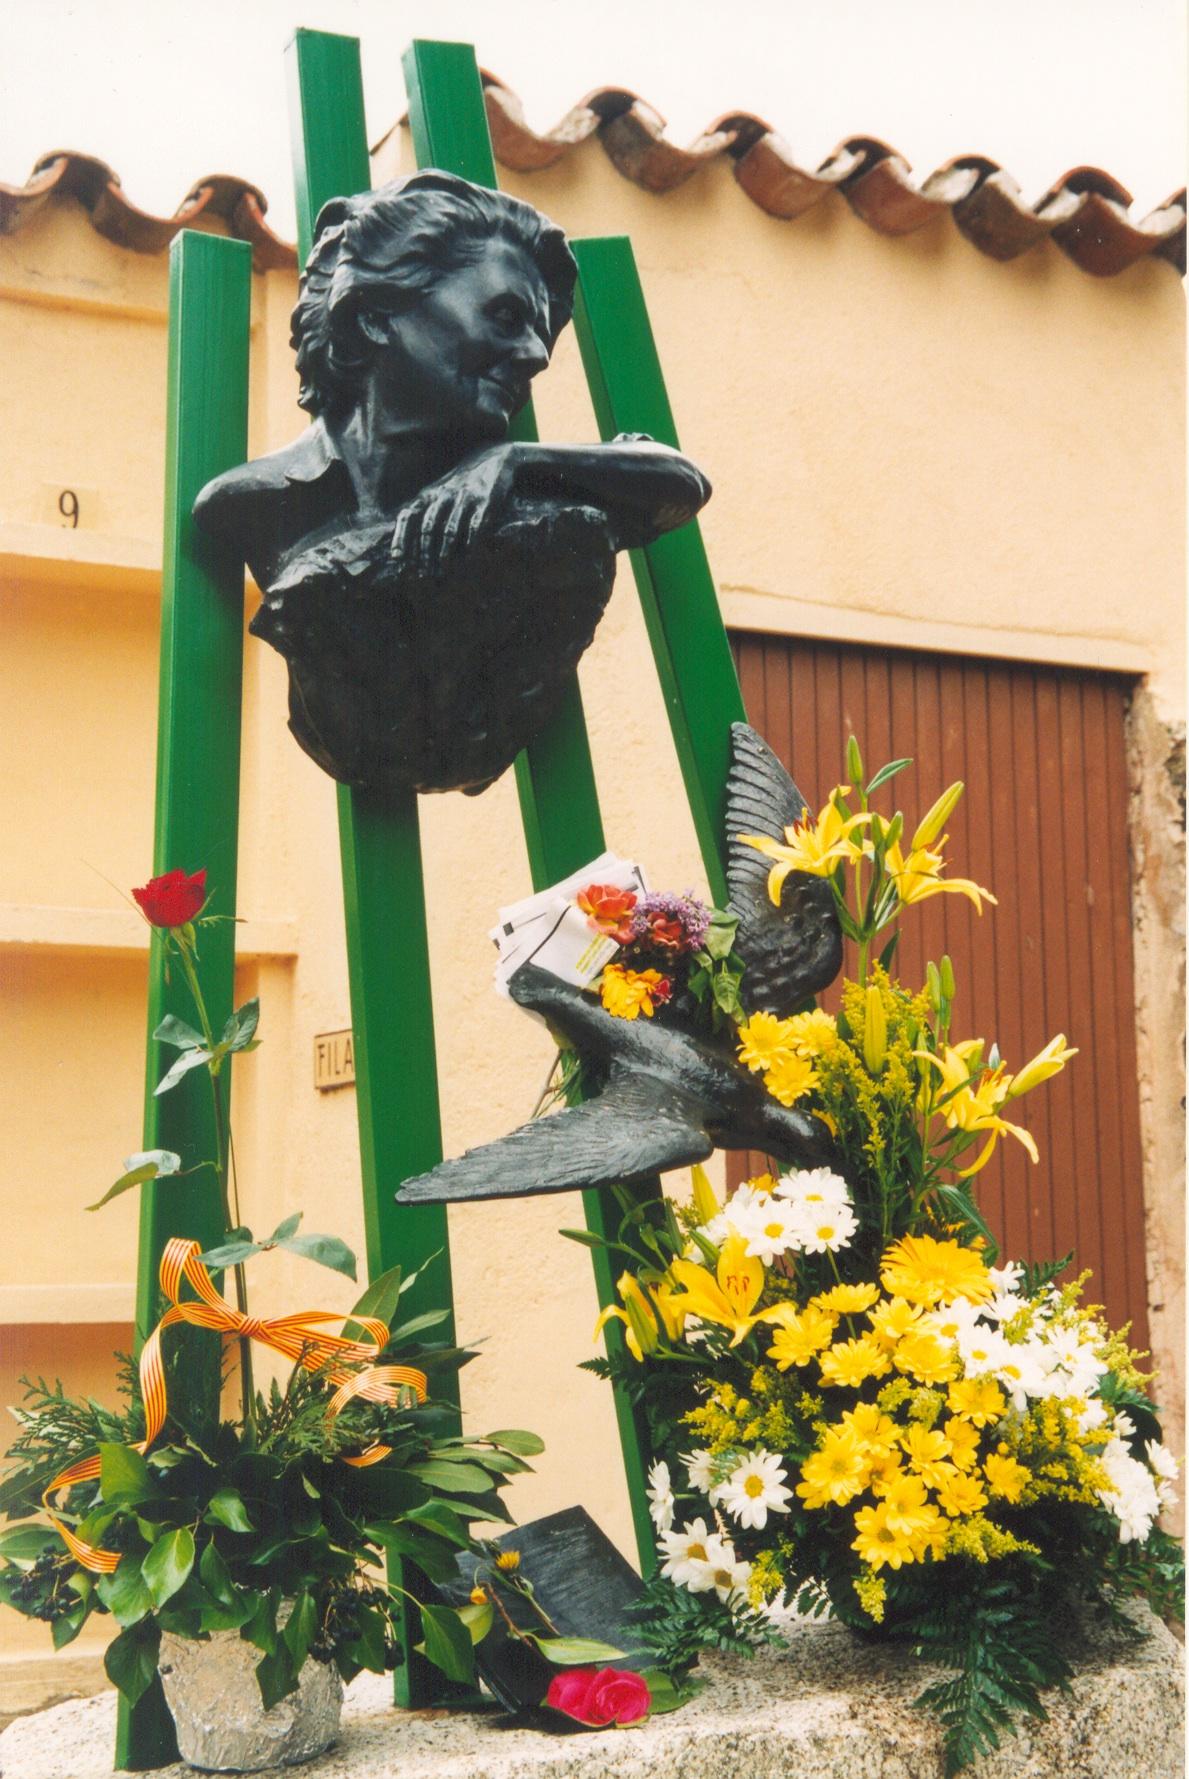 Tumba de Mercè Rodoreda en el cementerio de Romanyá.